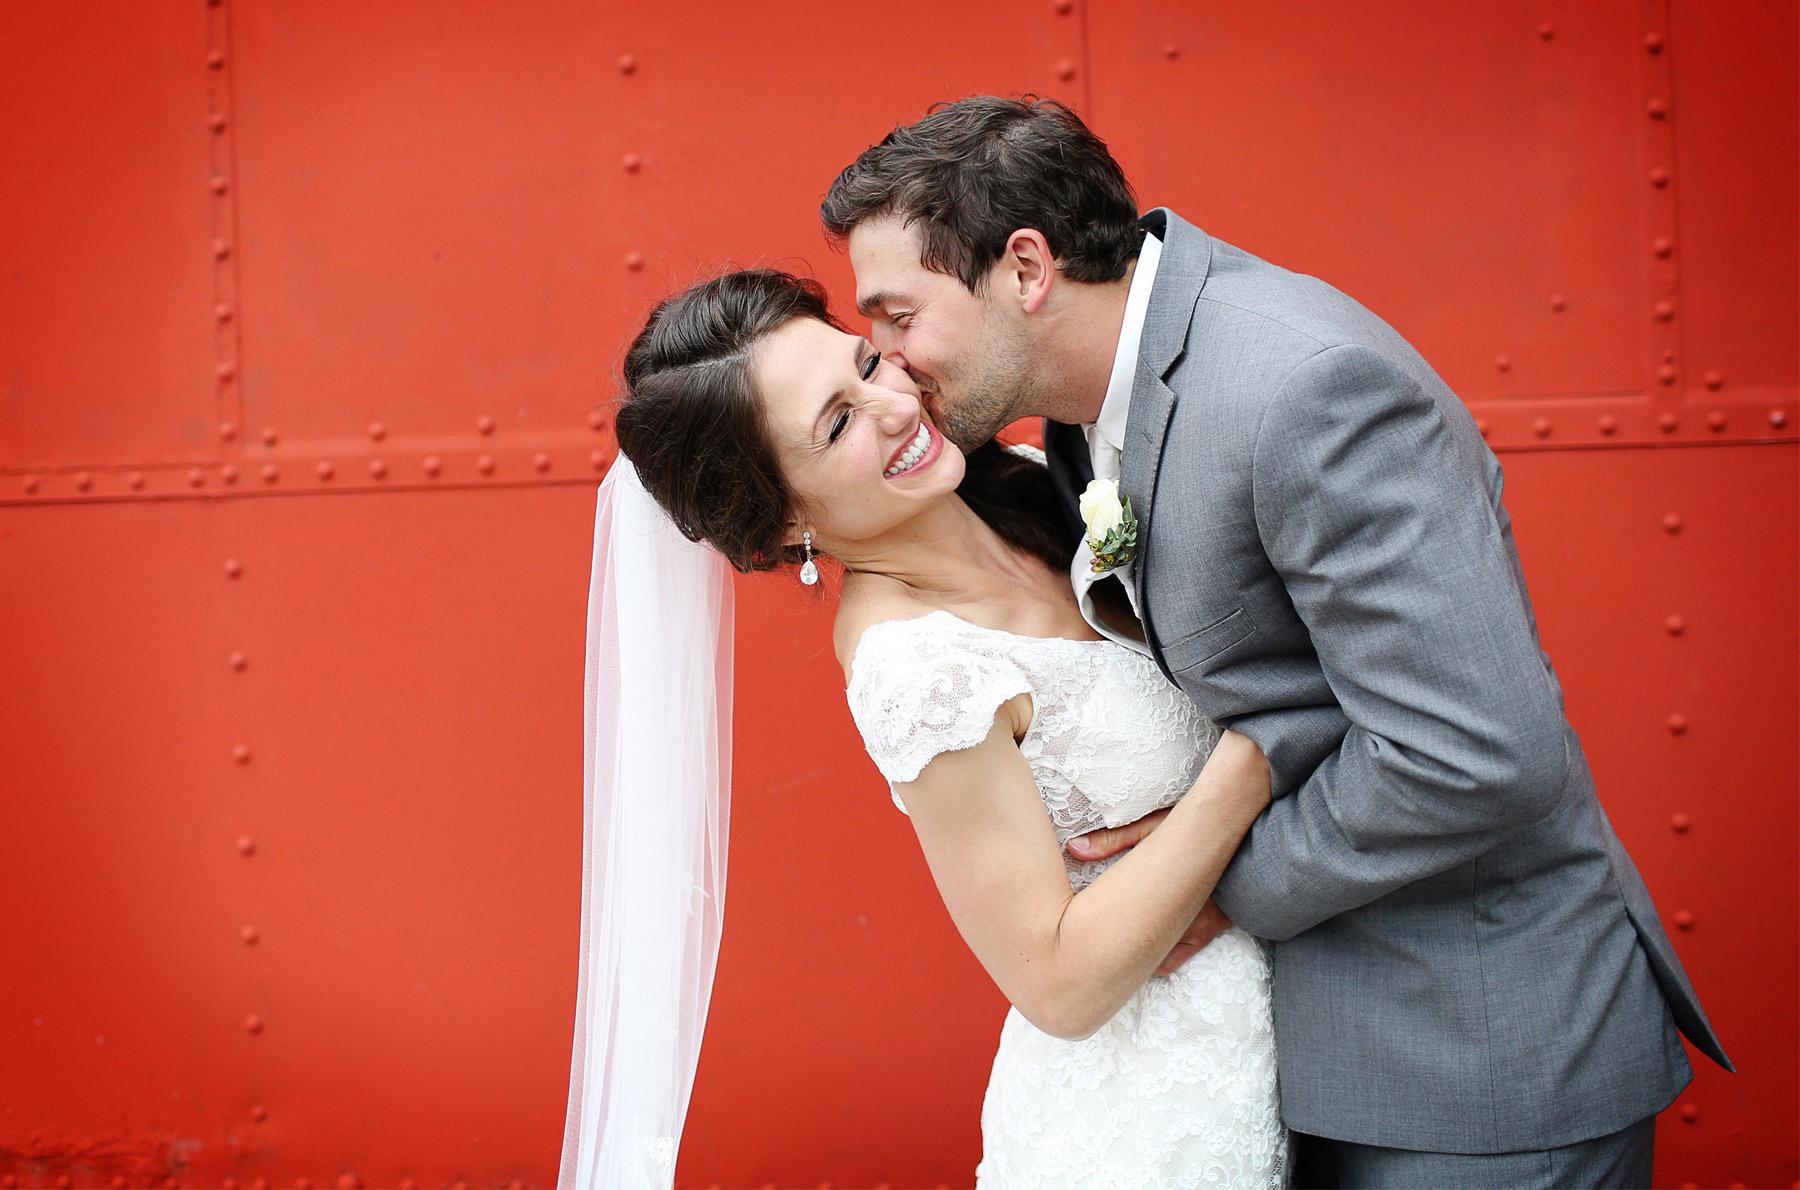 11-Stillwater-Minnesota-Wedding-Photography-by-Vick-Photography-Alicia-&-Cole.jpg